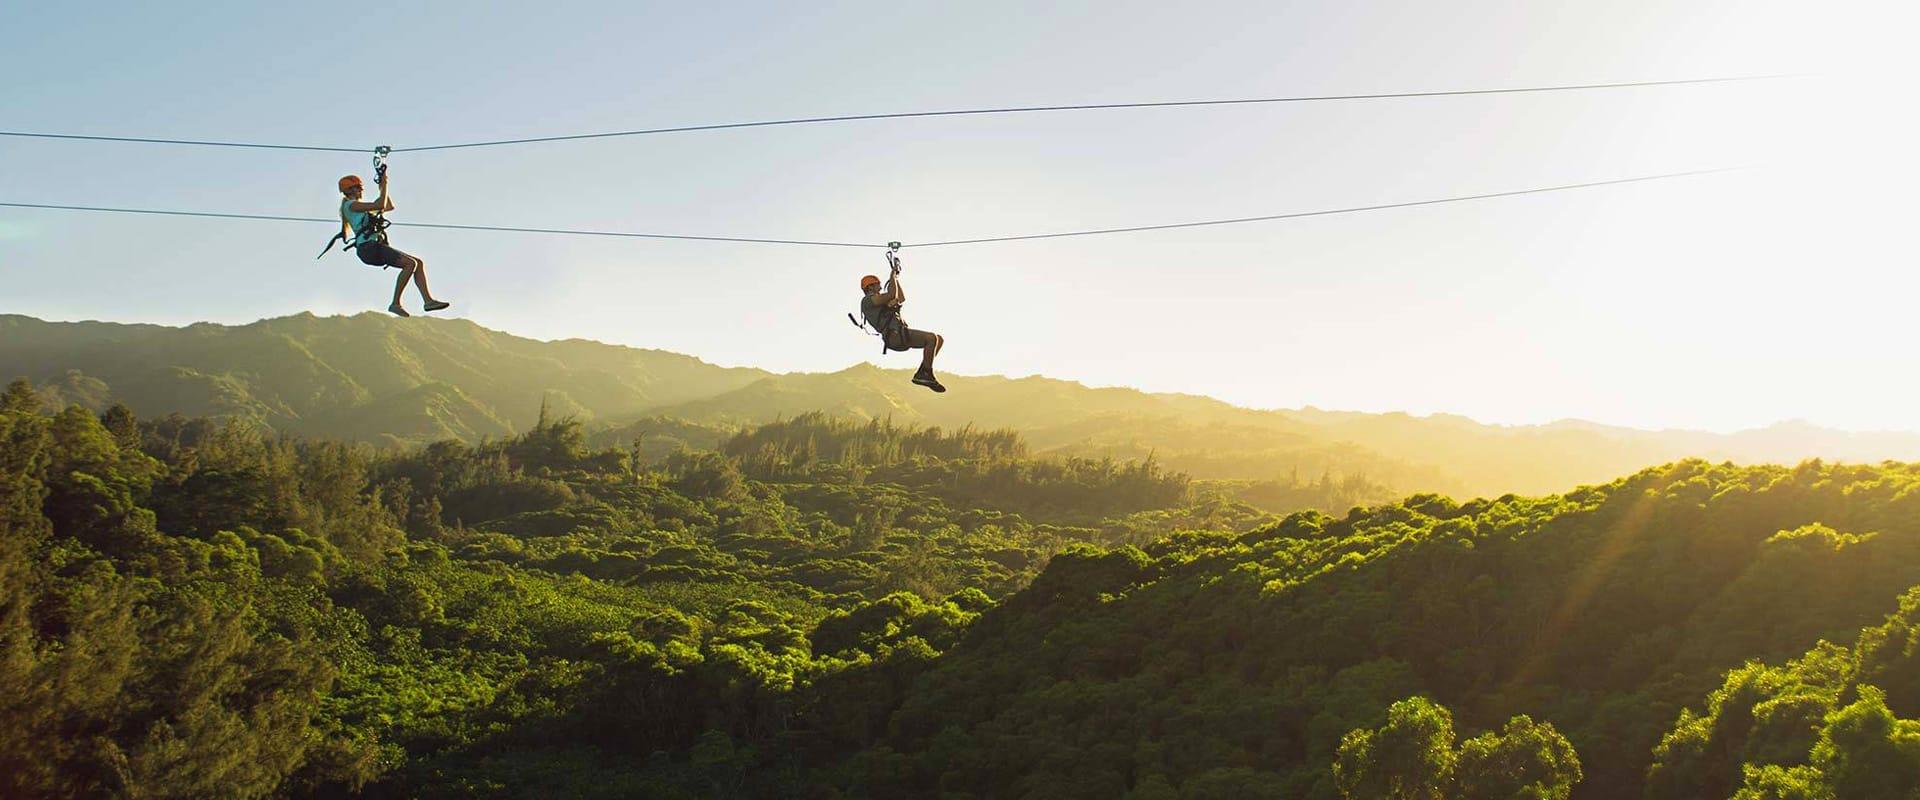 Guided Zipline Tour on Oahu's Longest Ziplines